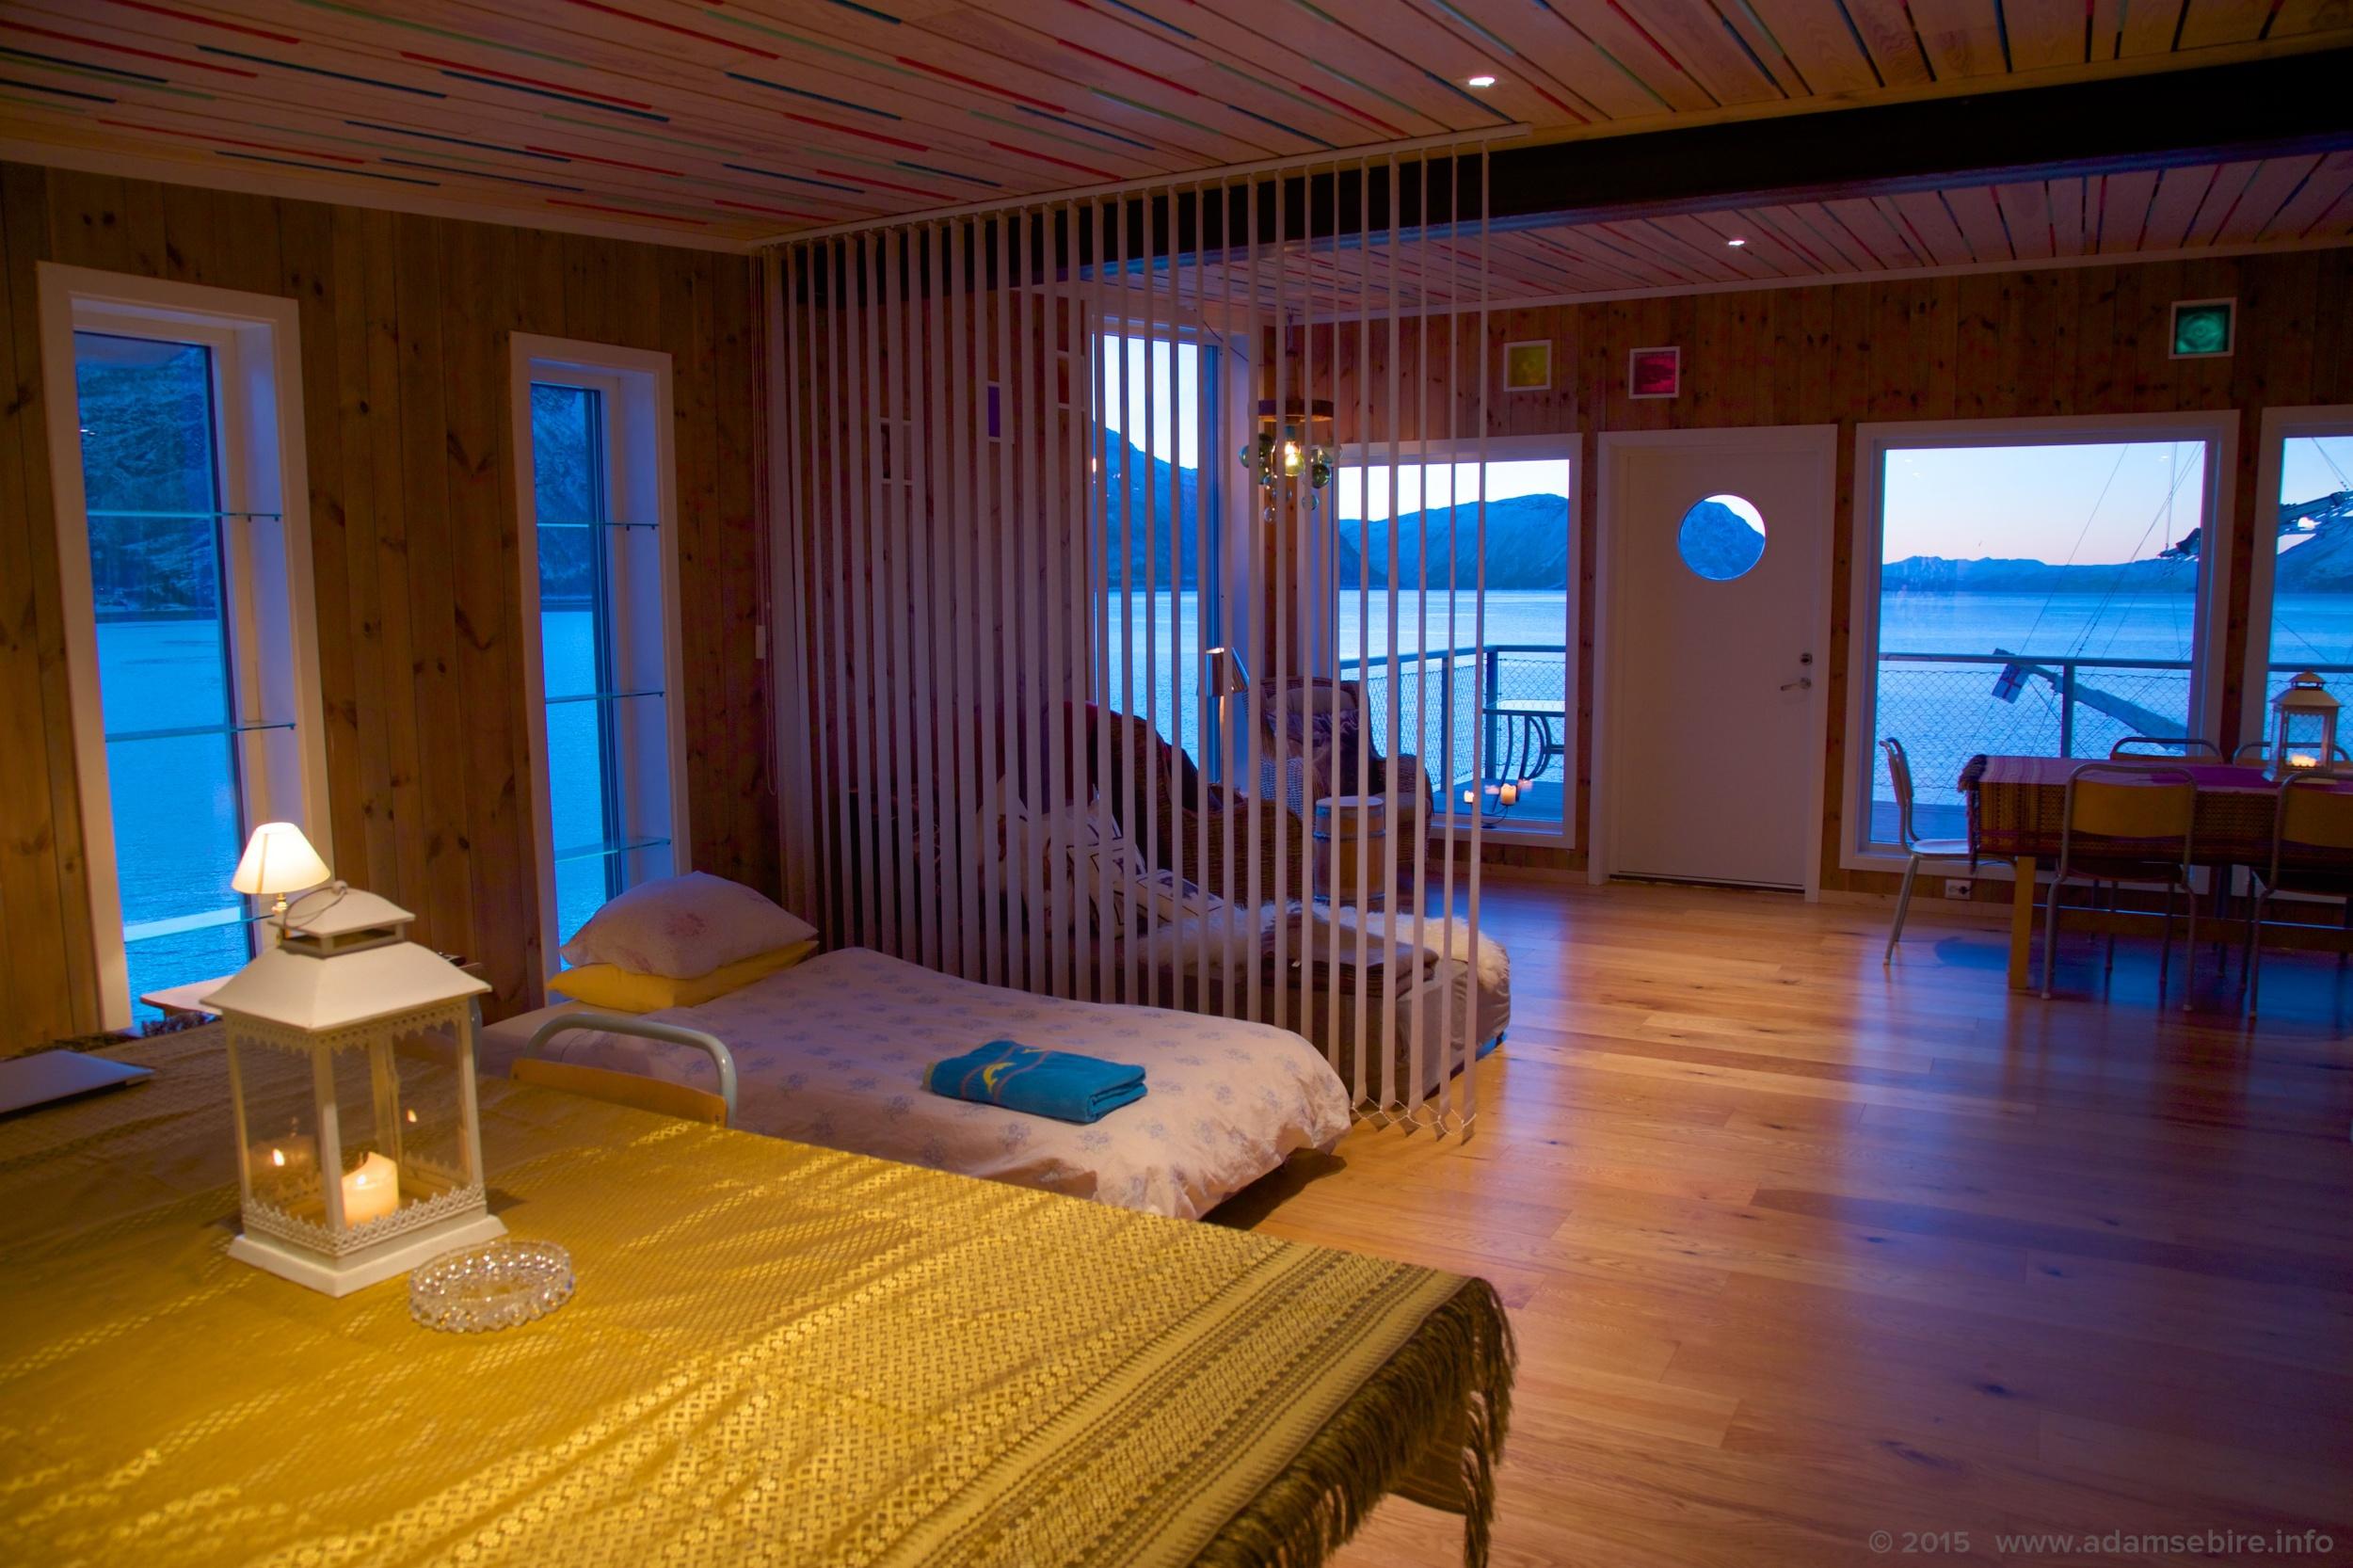 Airbnb interior photograph, Arctic Norway